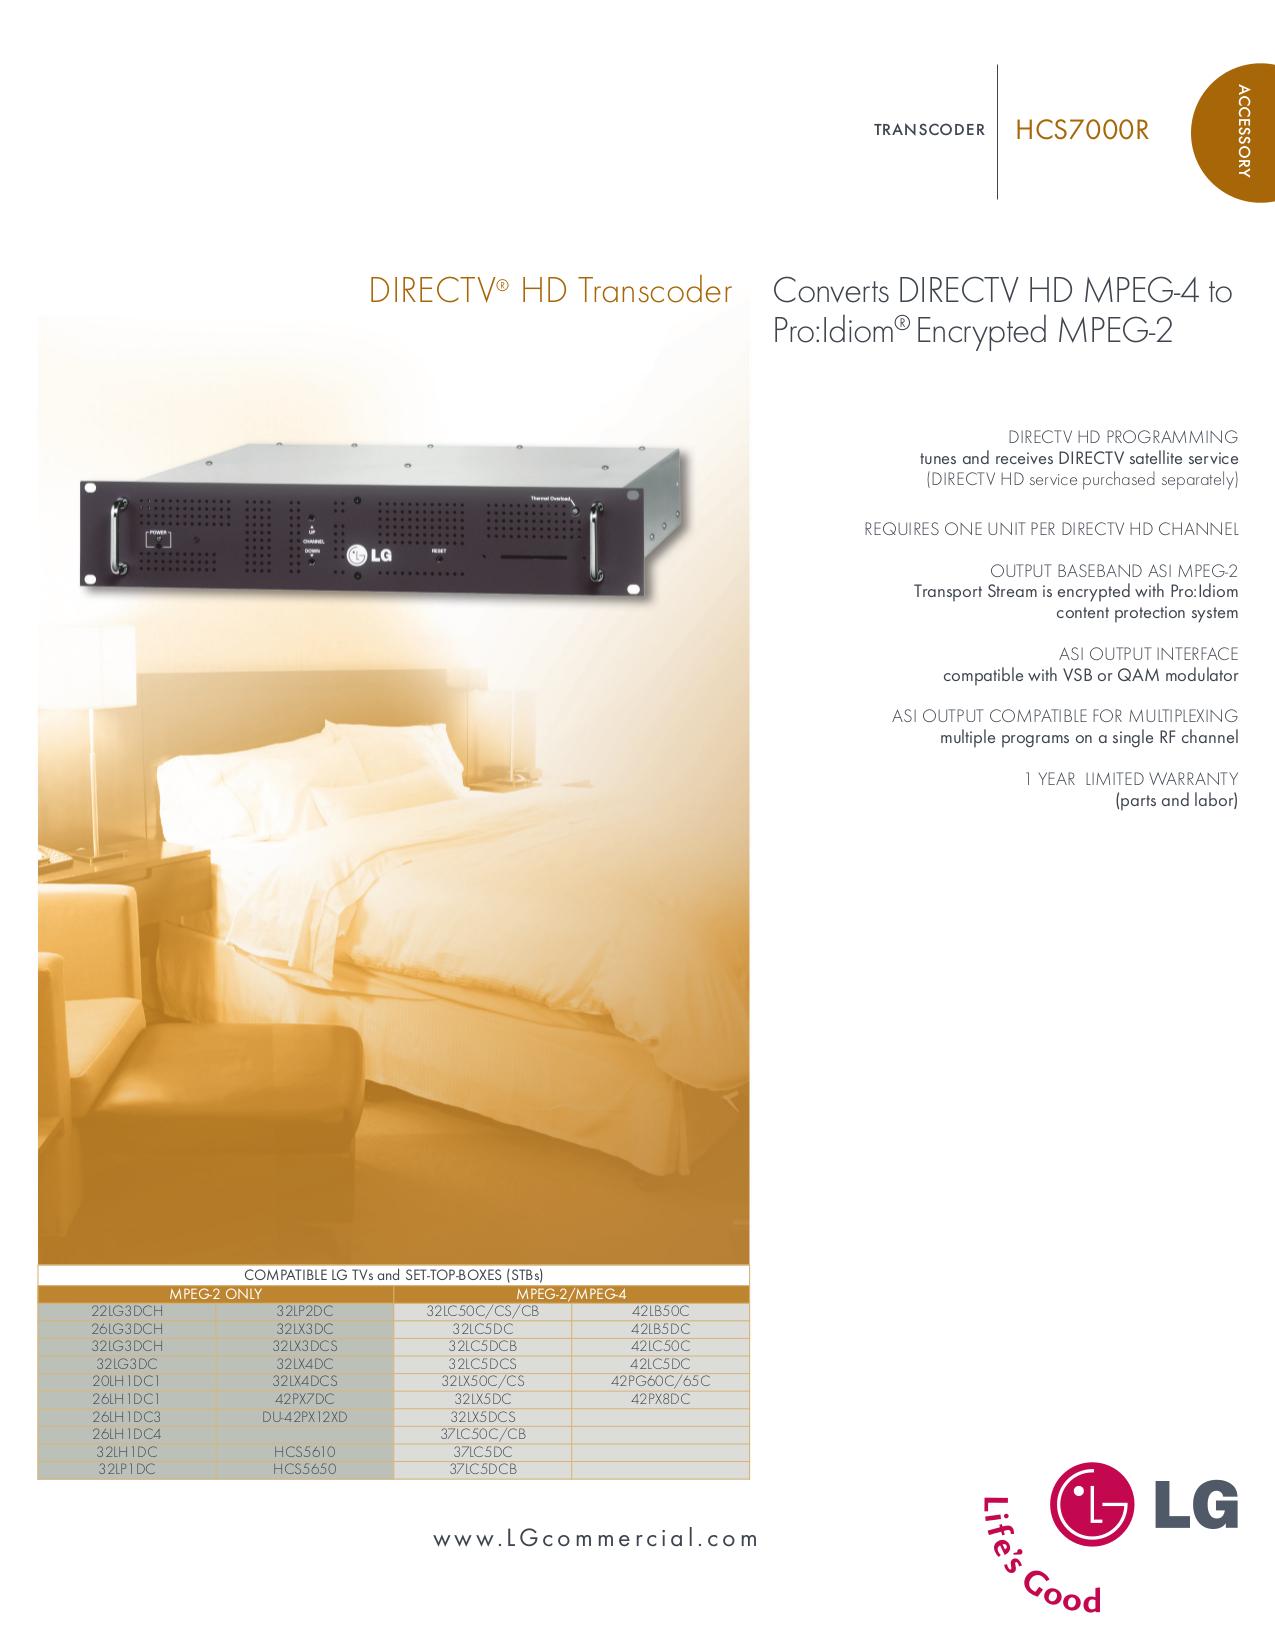 pdf for LG TV 37LC5DCB manual